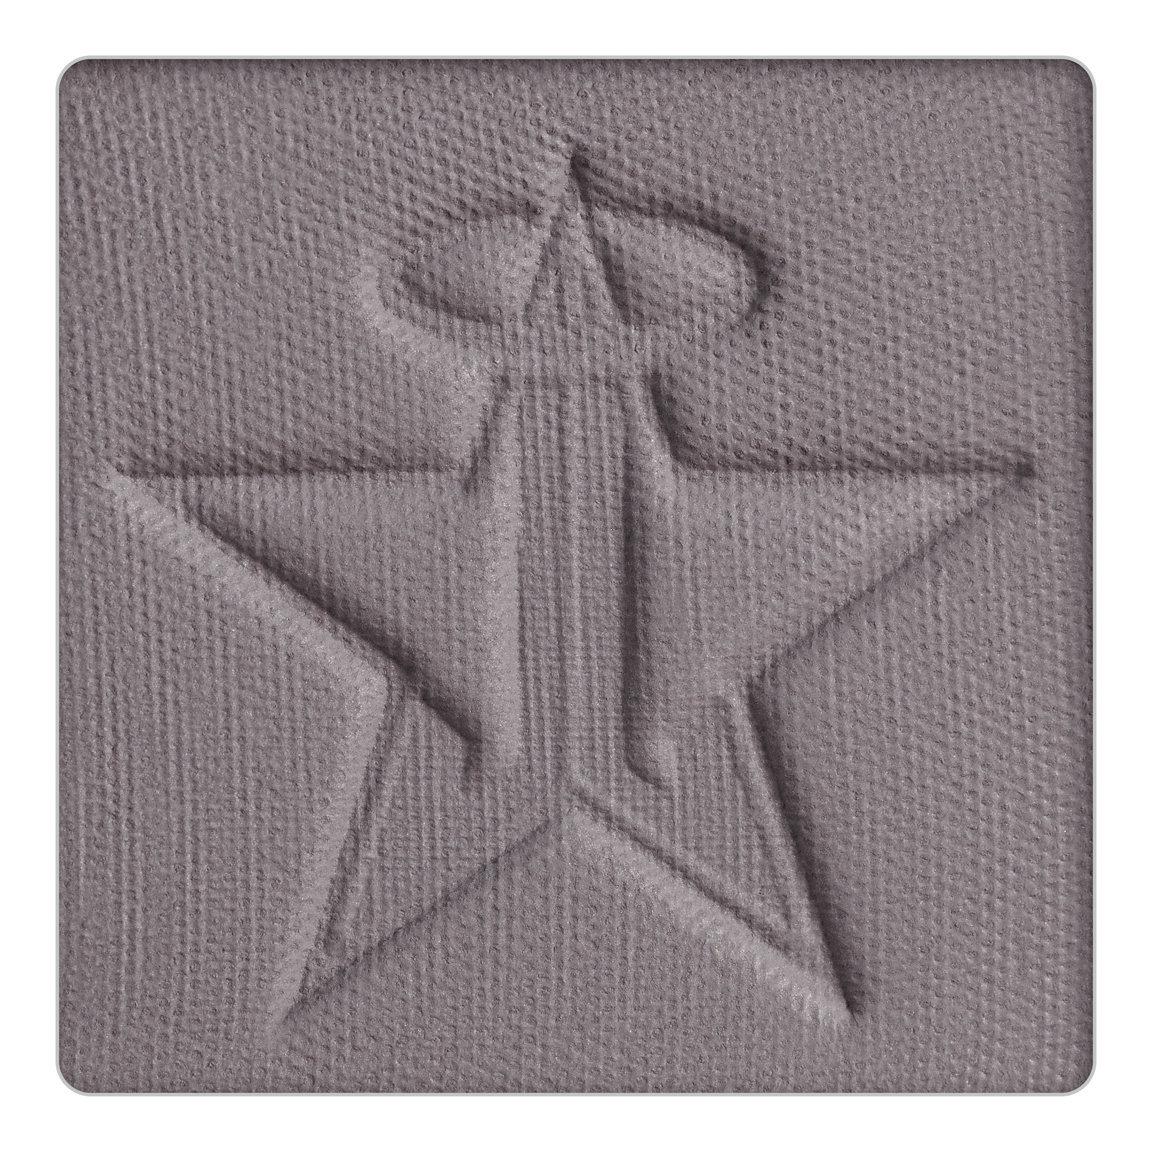 Jeffree Star Cosmetics Artistry Singles Eulogy alternative view 1.